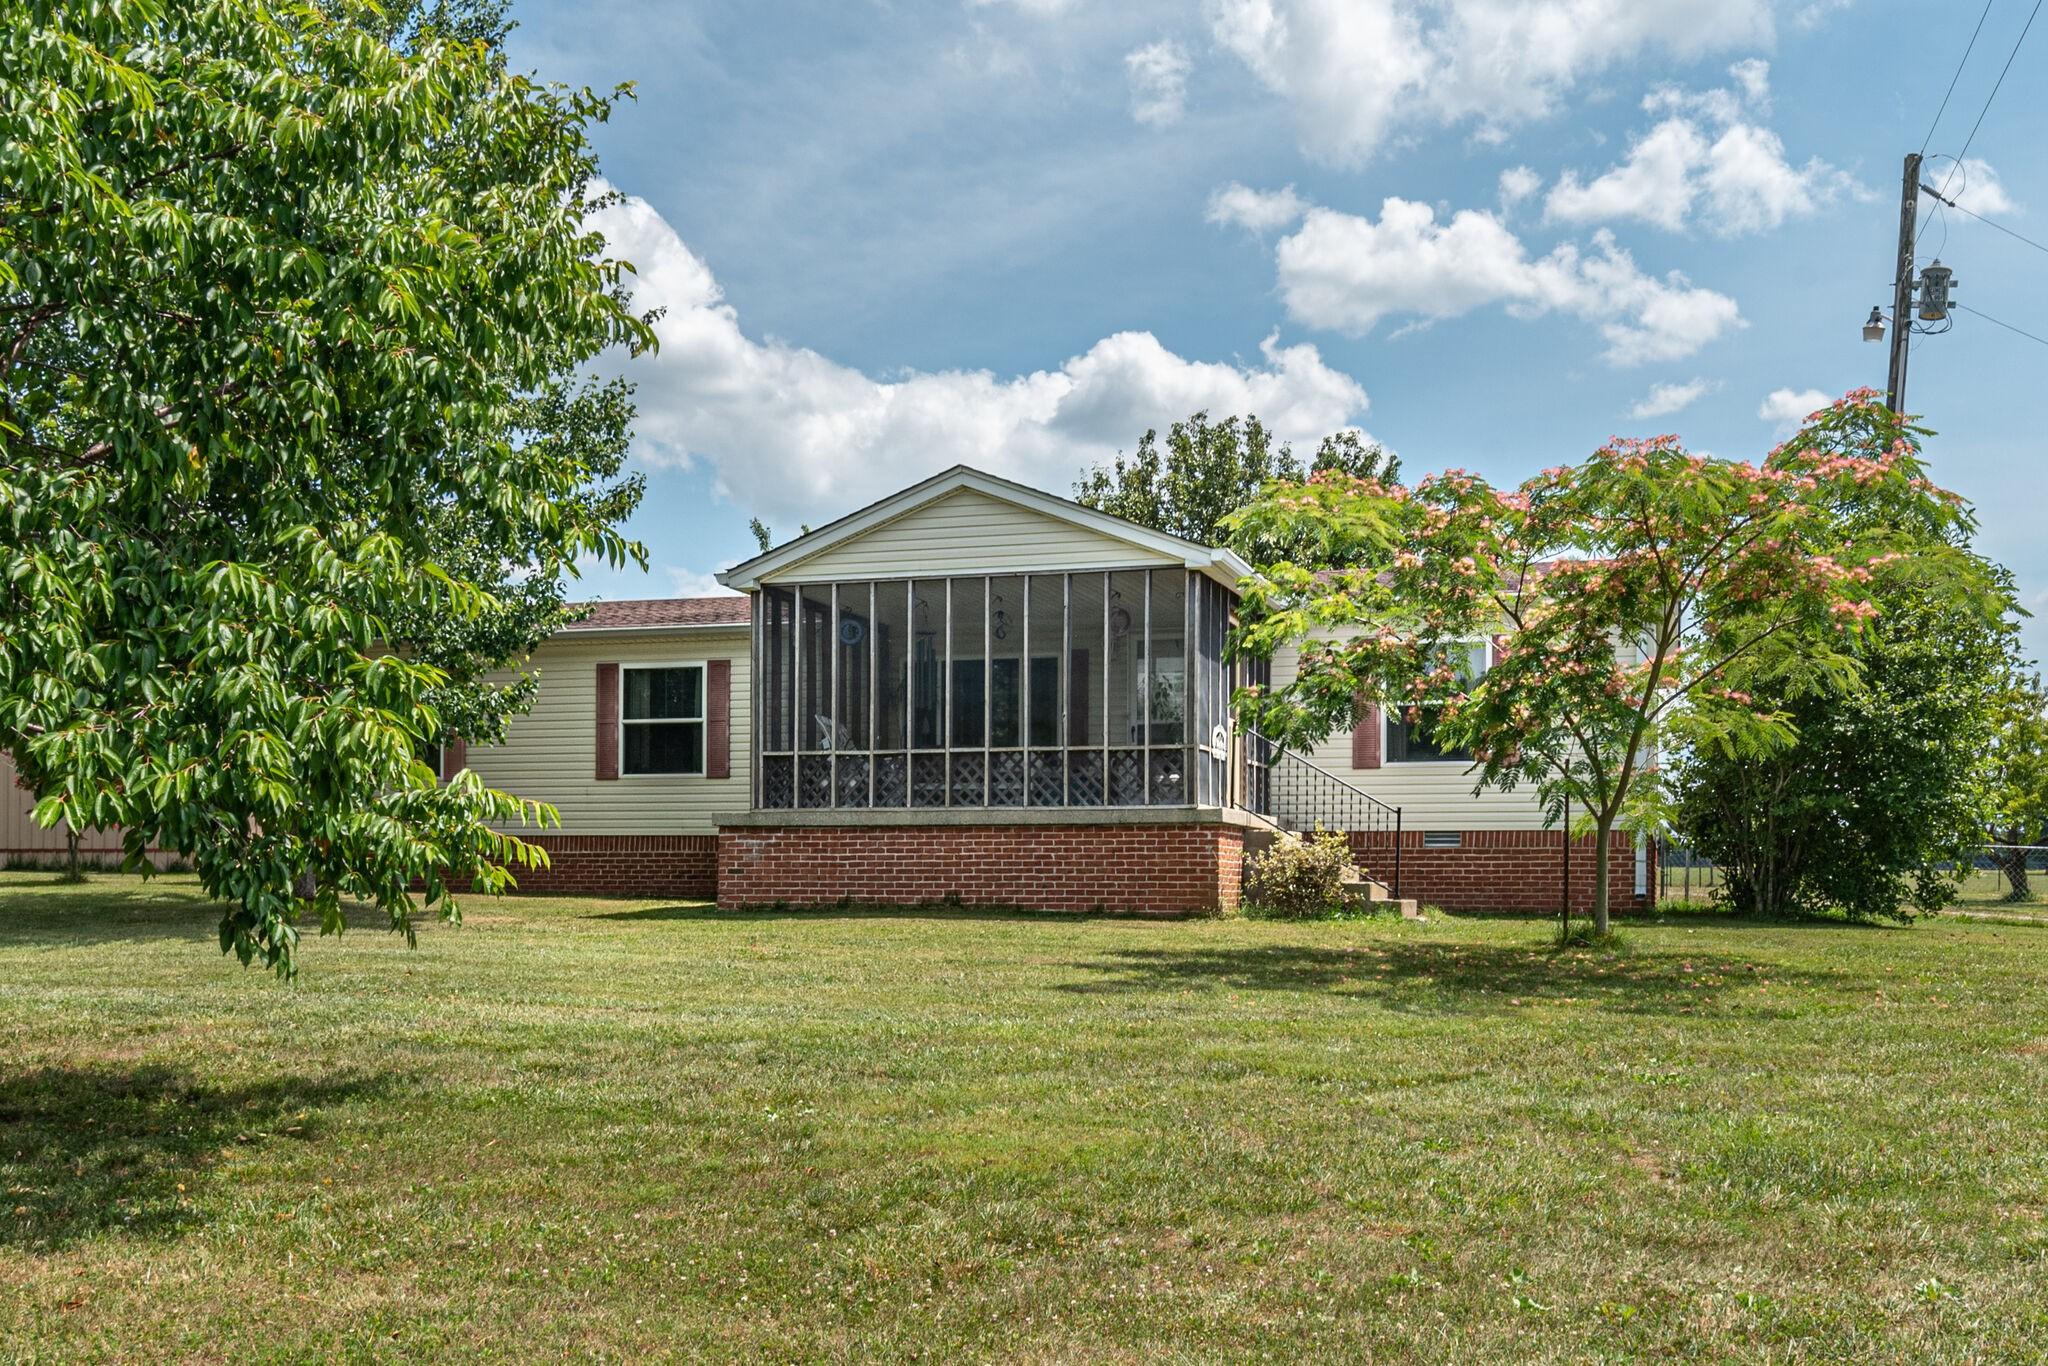 Ben Burnell Property Real Estate Listings Main Image